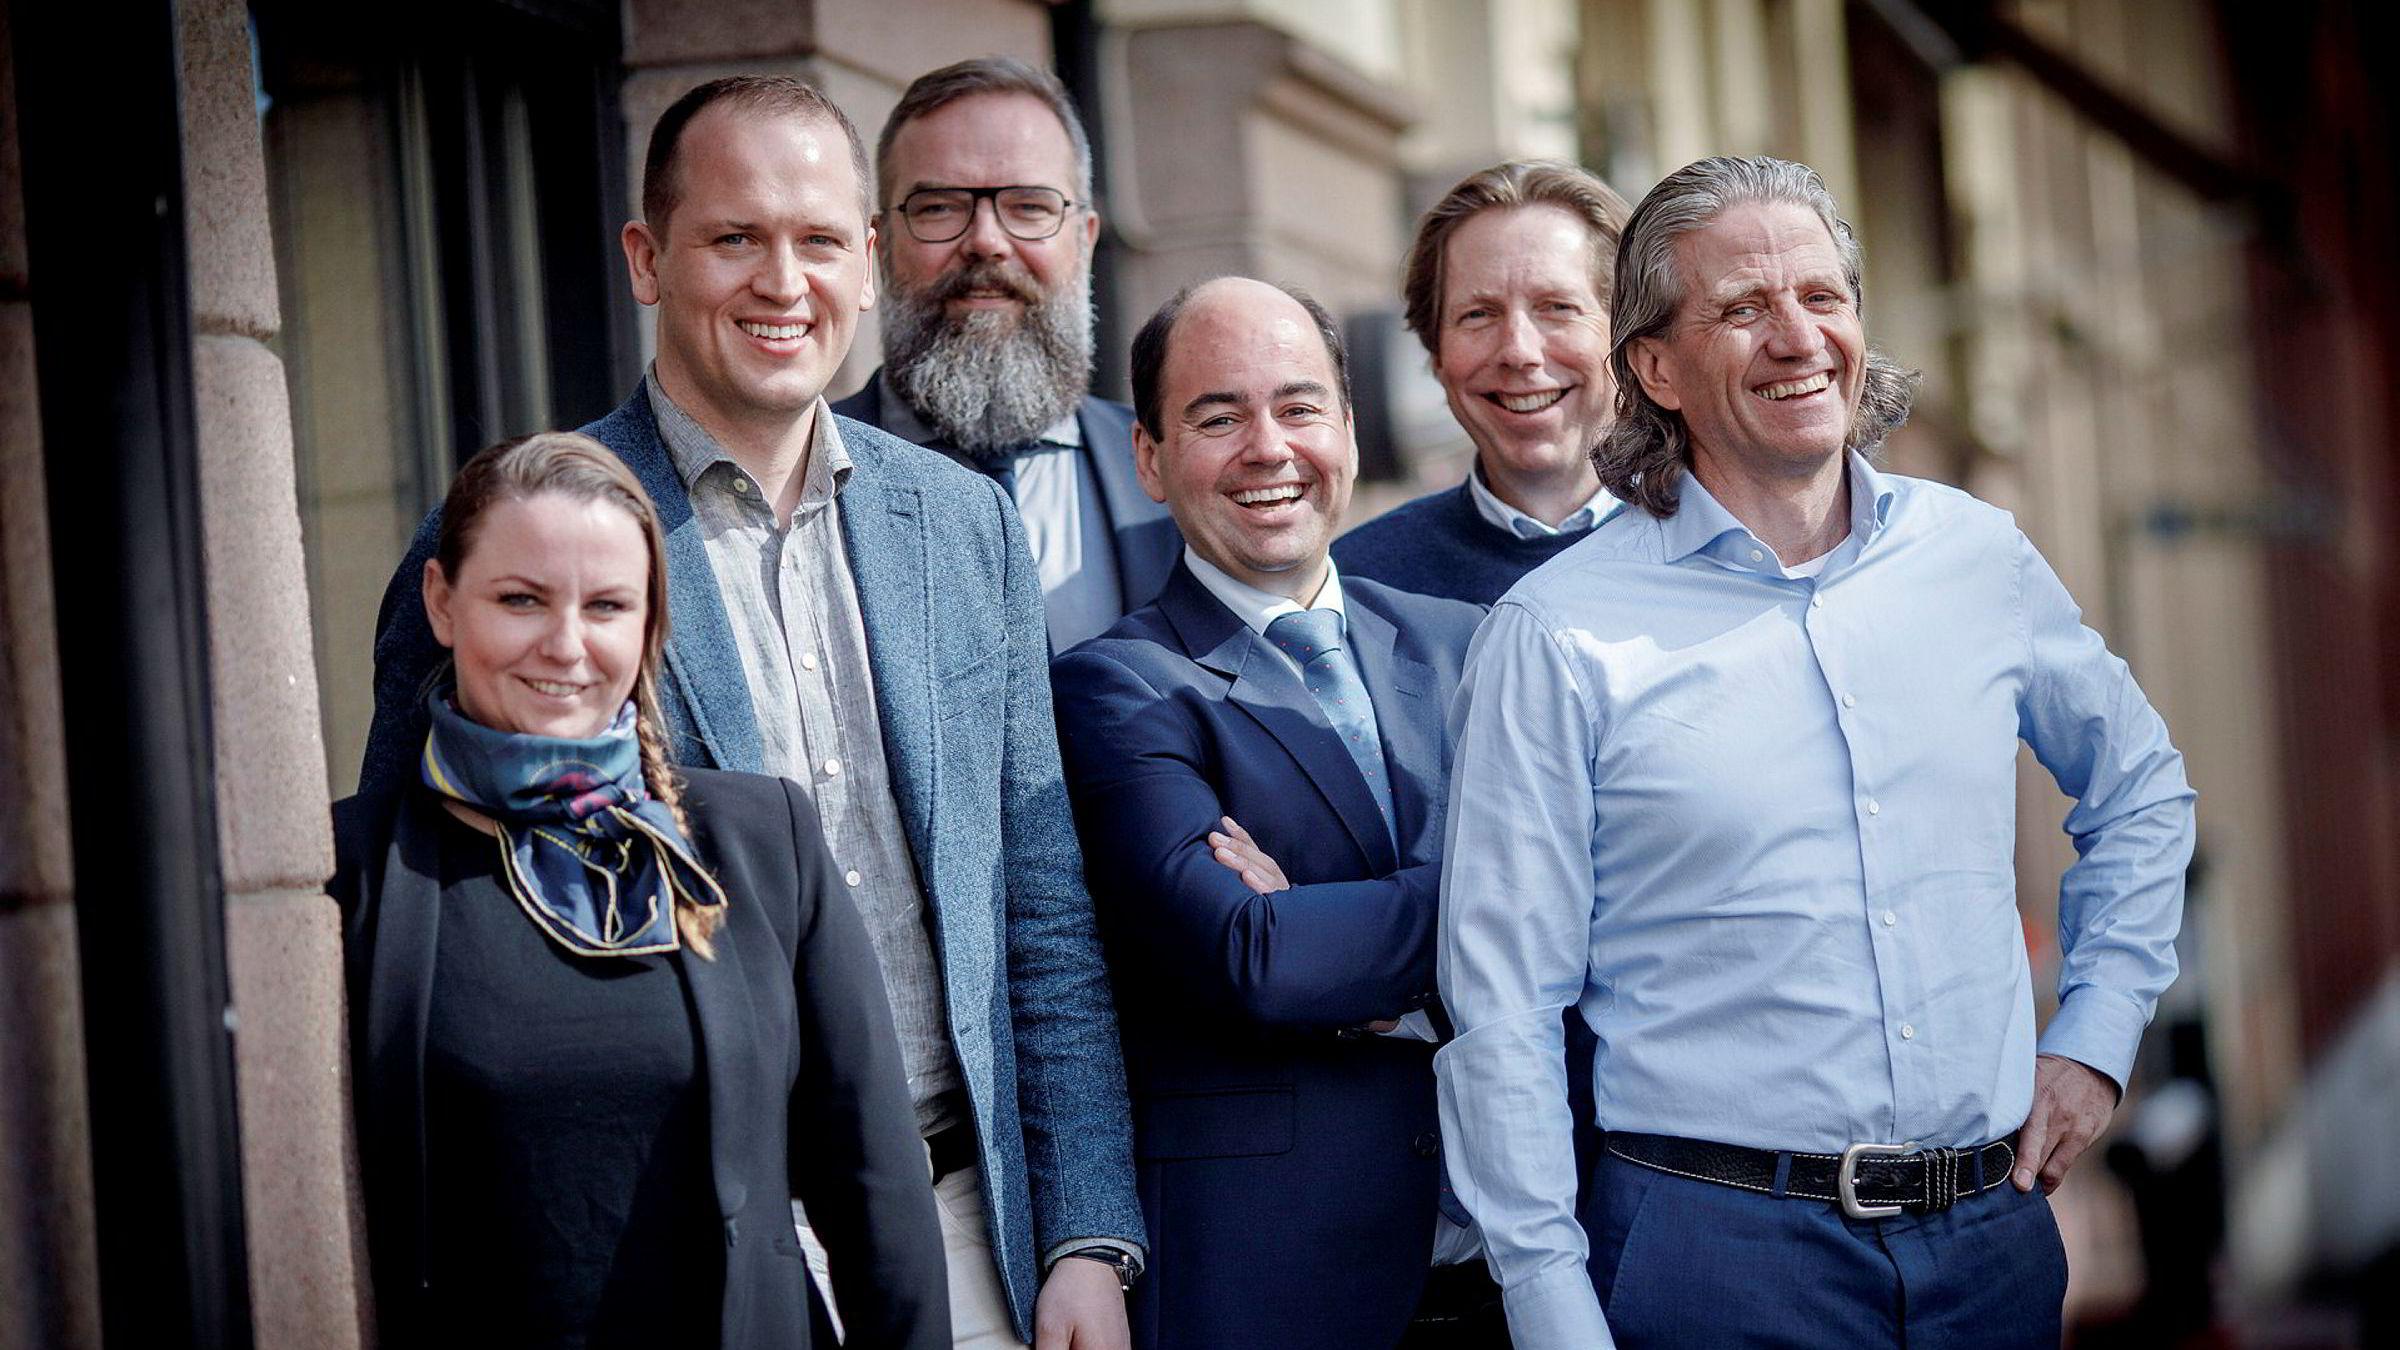 Dentsu Aegis kjøper Red-gruppen. Fra venstre, konsernsjef Maria Aas-Eng i Red, Magnus Strømnes Bøe, Red Performance, Paal Fure, administrerende direktør Dentsu Aegis Network Norway, Fredrik Taranger, finansdirektør Dentsu Aegis Network Norway, Christian Espeseth, Red Media og Nils Røang i Red gruppen.